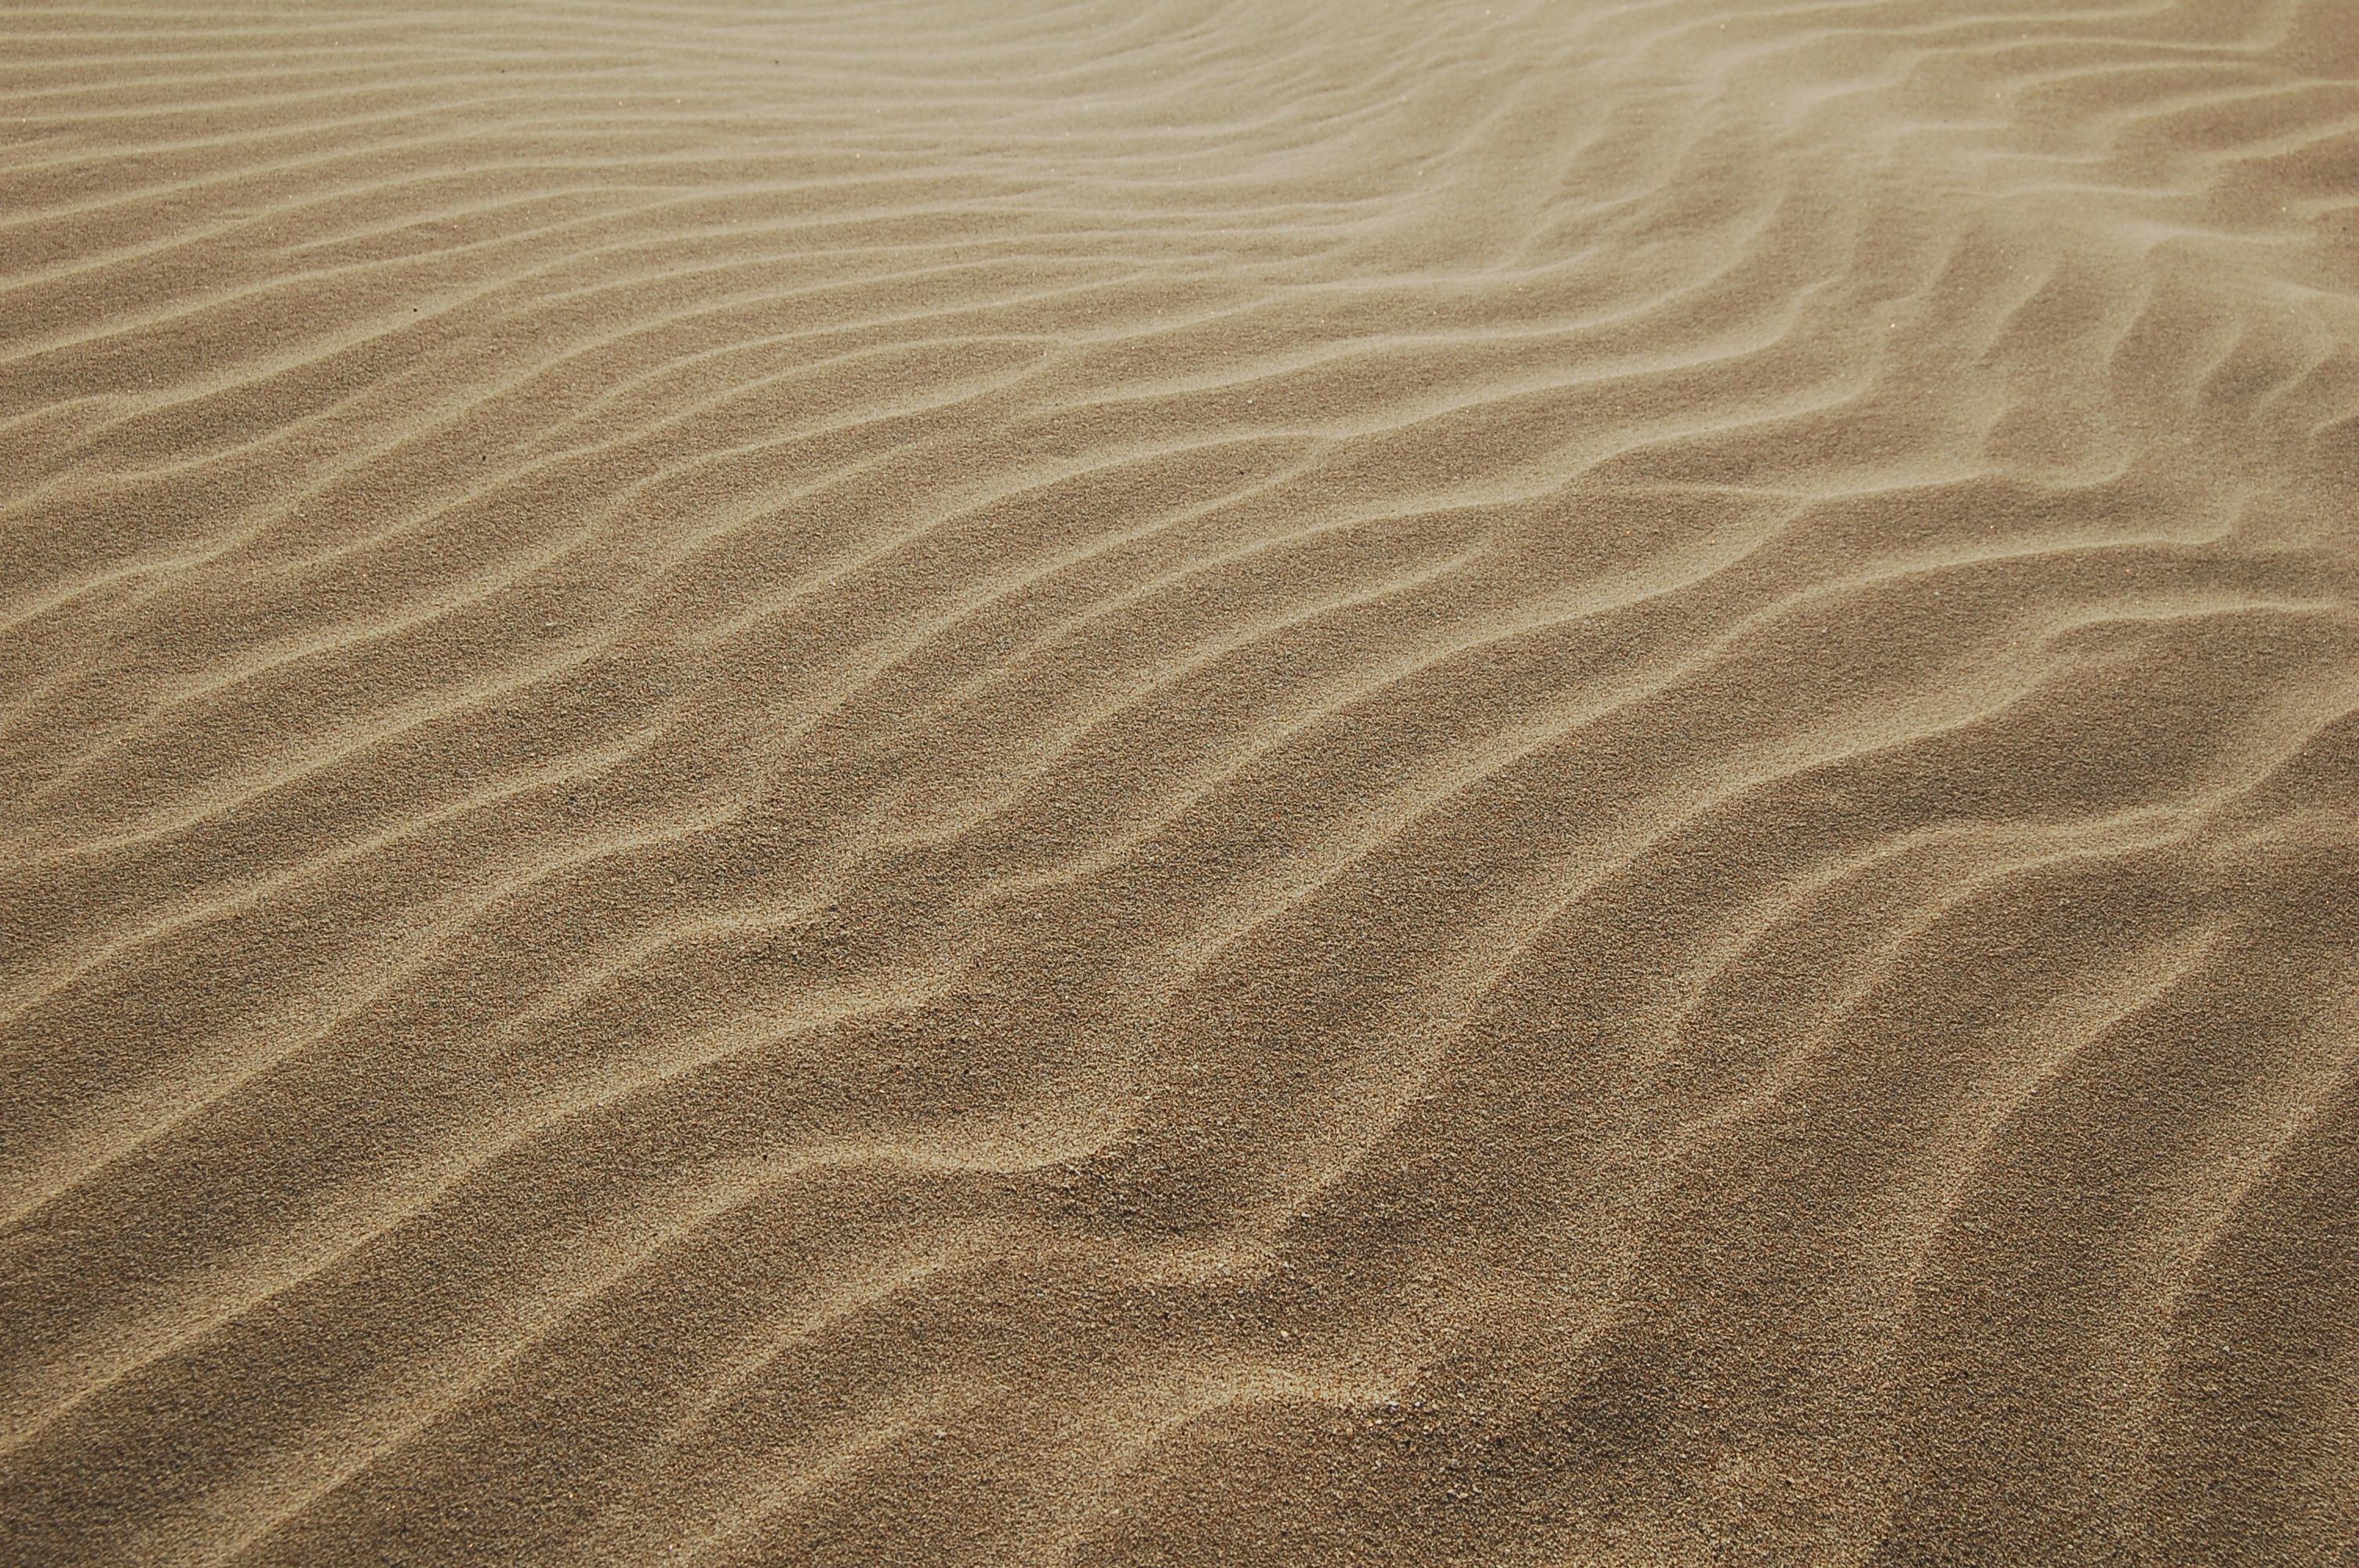 Free Images Sand Wood Texture Desert Floor Line